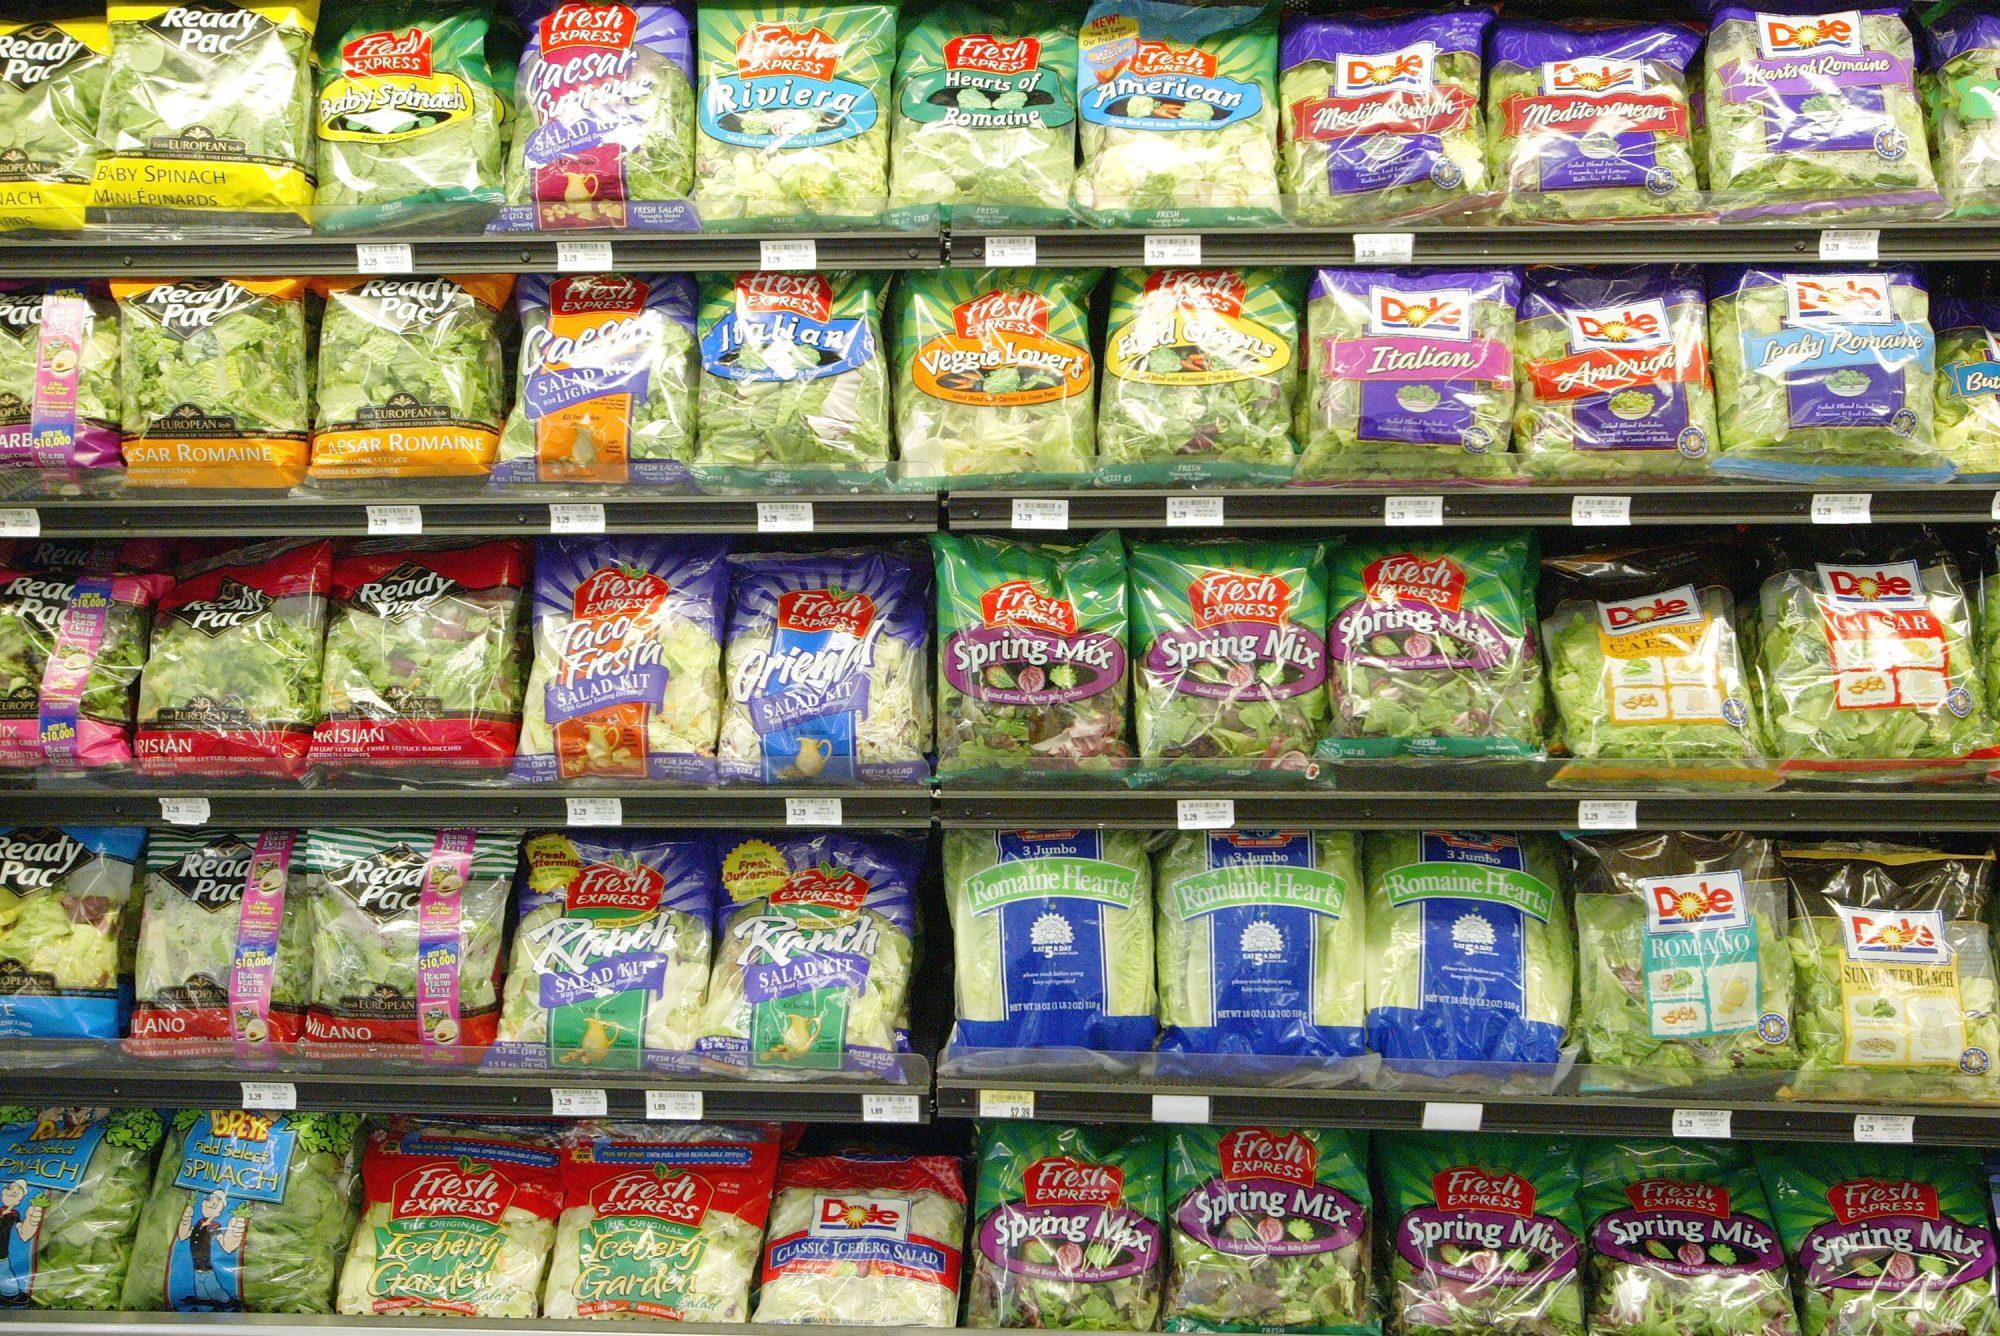 031219_Getty Bagged Salad